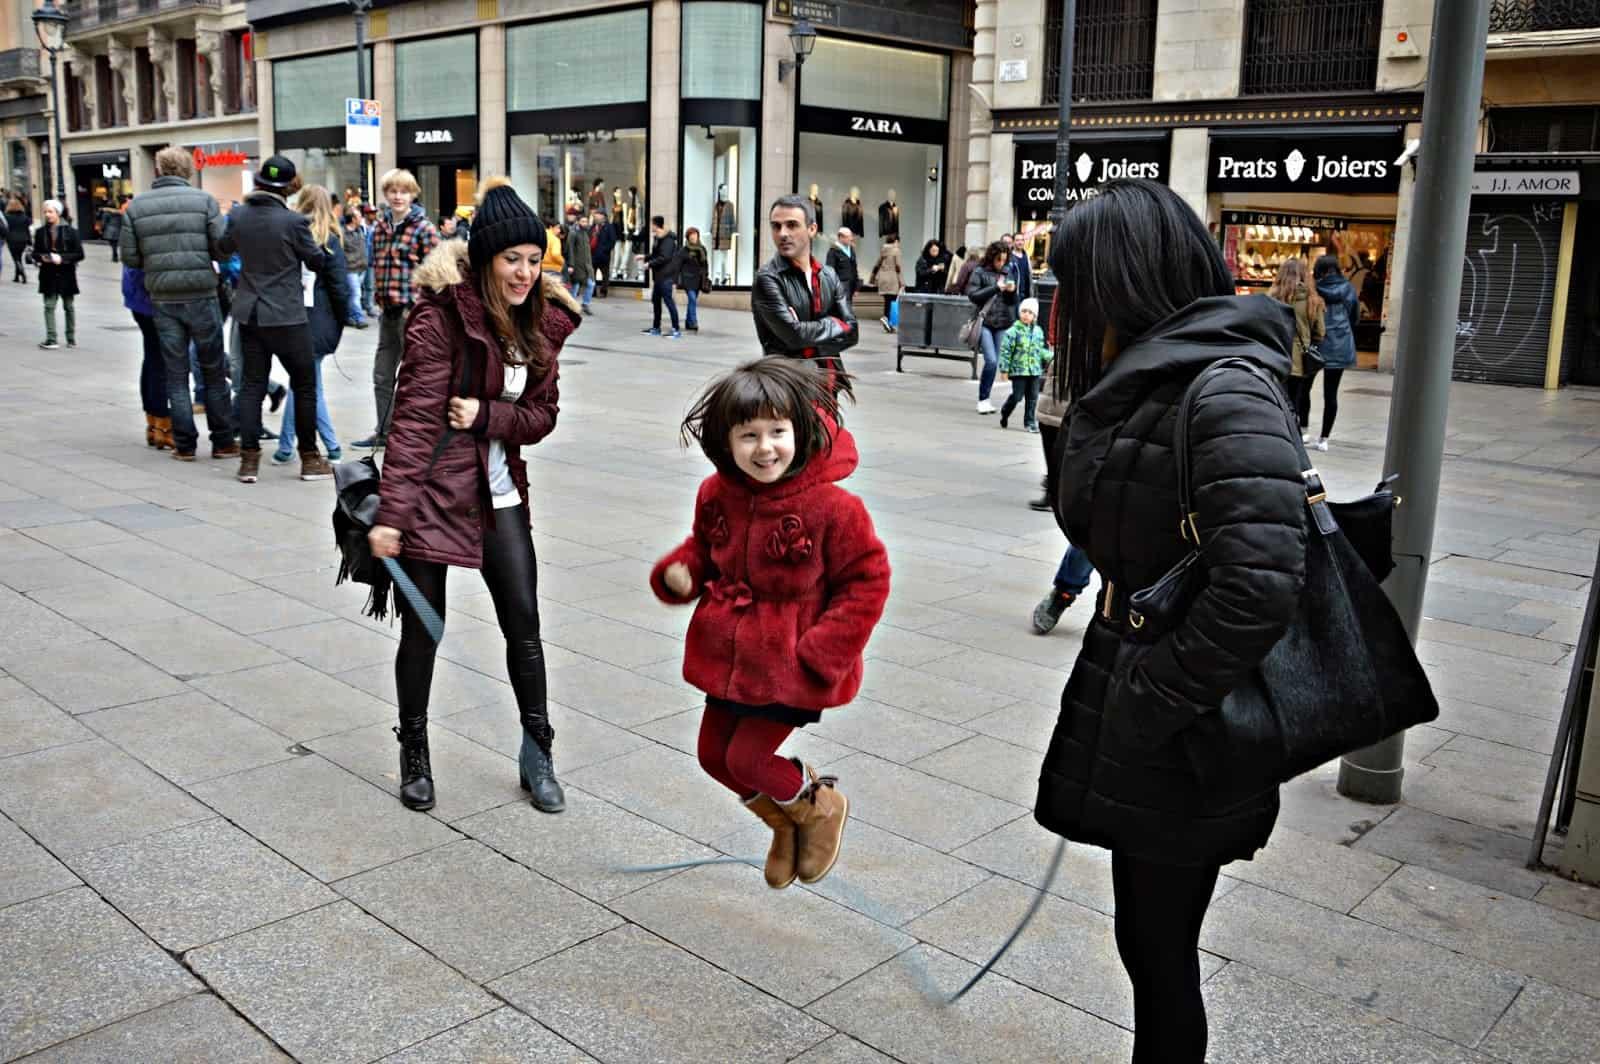 Fin de semana en Barcelona con la familia. Barcelona